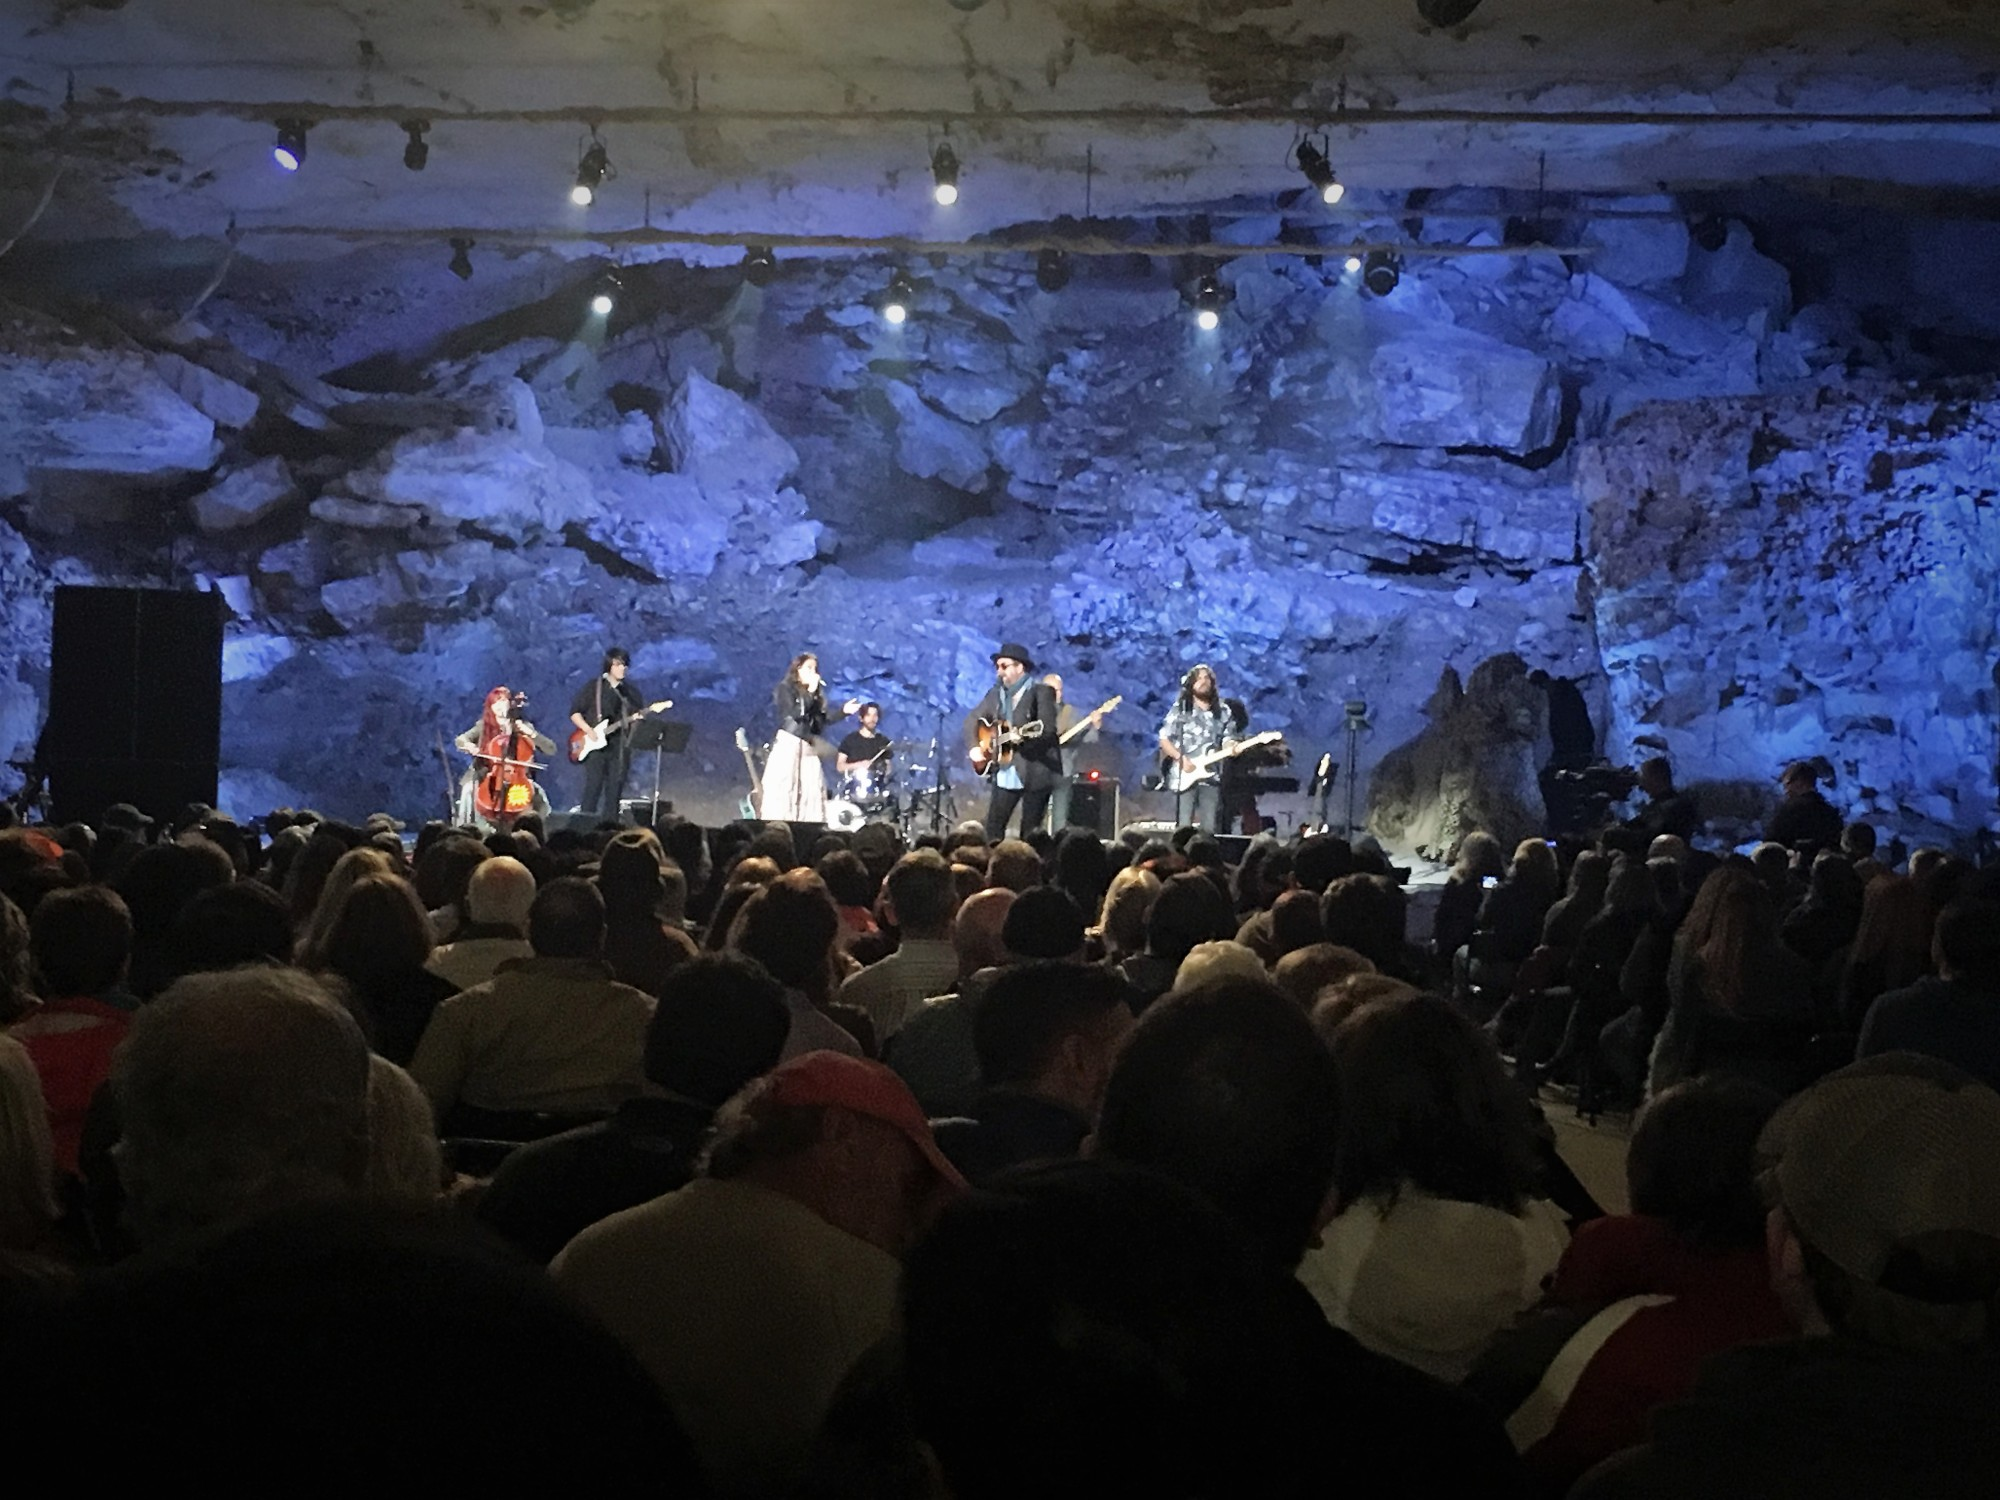 Pelham Pointe Vacation Rental Cabin The Caverns